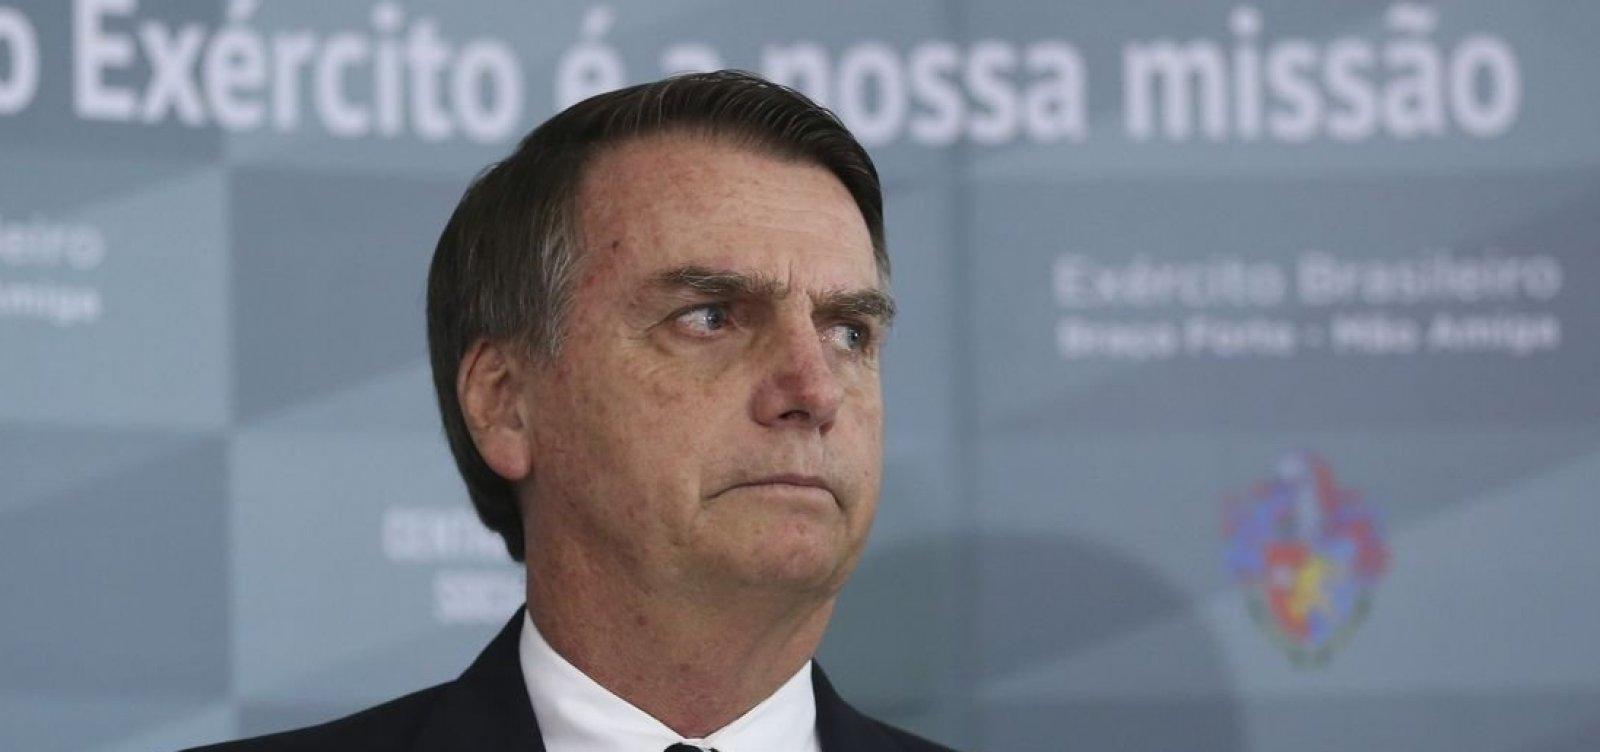 'Vai demorar ainda', diz Bolsonaro sobre reforma administrativa